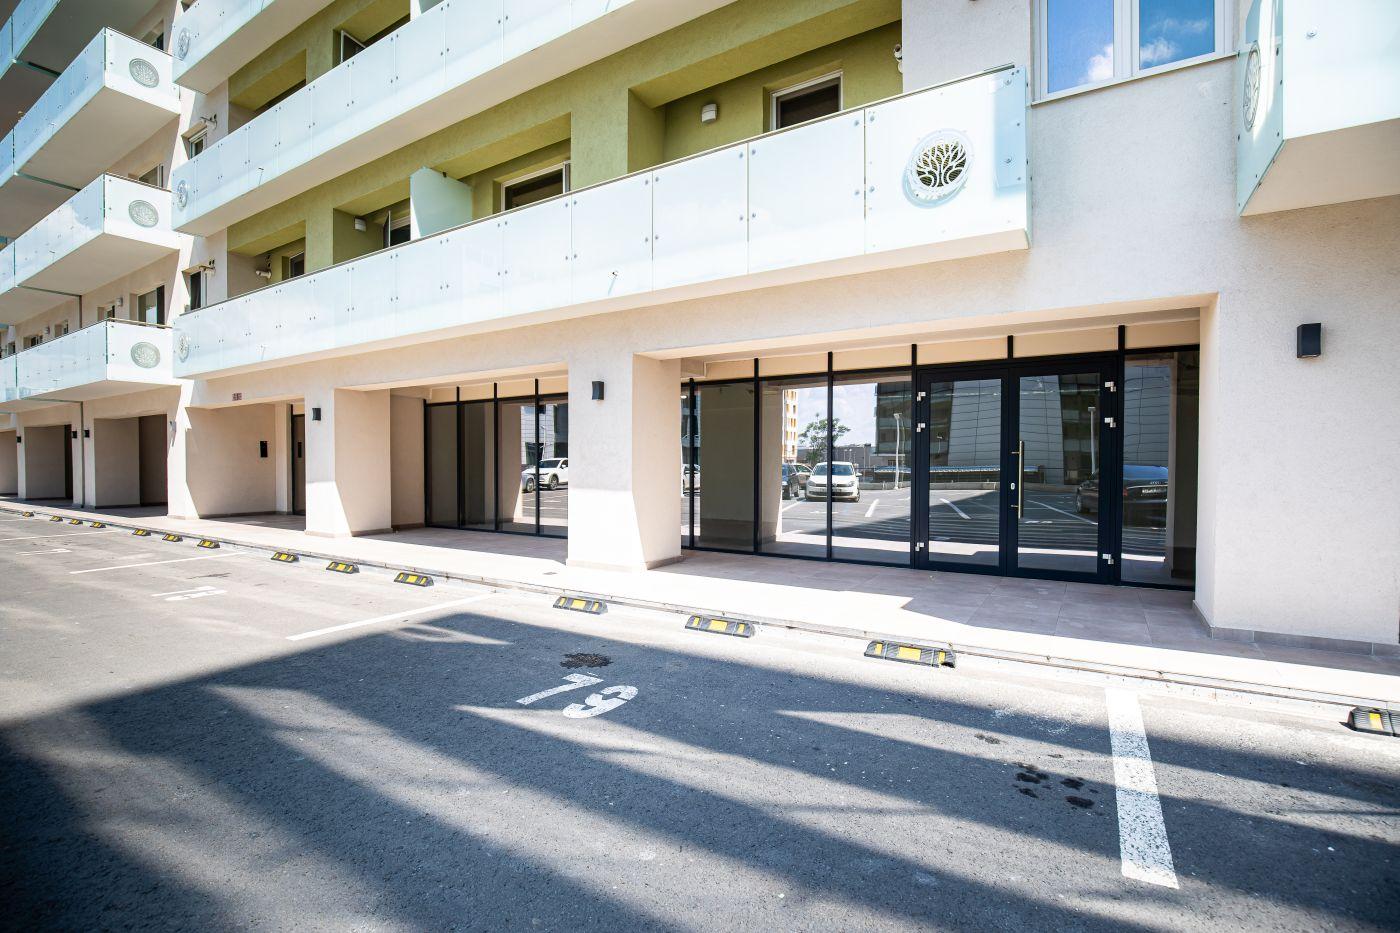 conest-grand-residence-spatii-comerciale-de-inchiriat-iasi-cgr-08